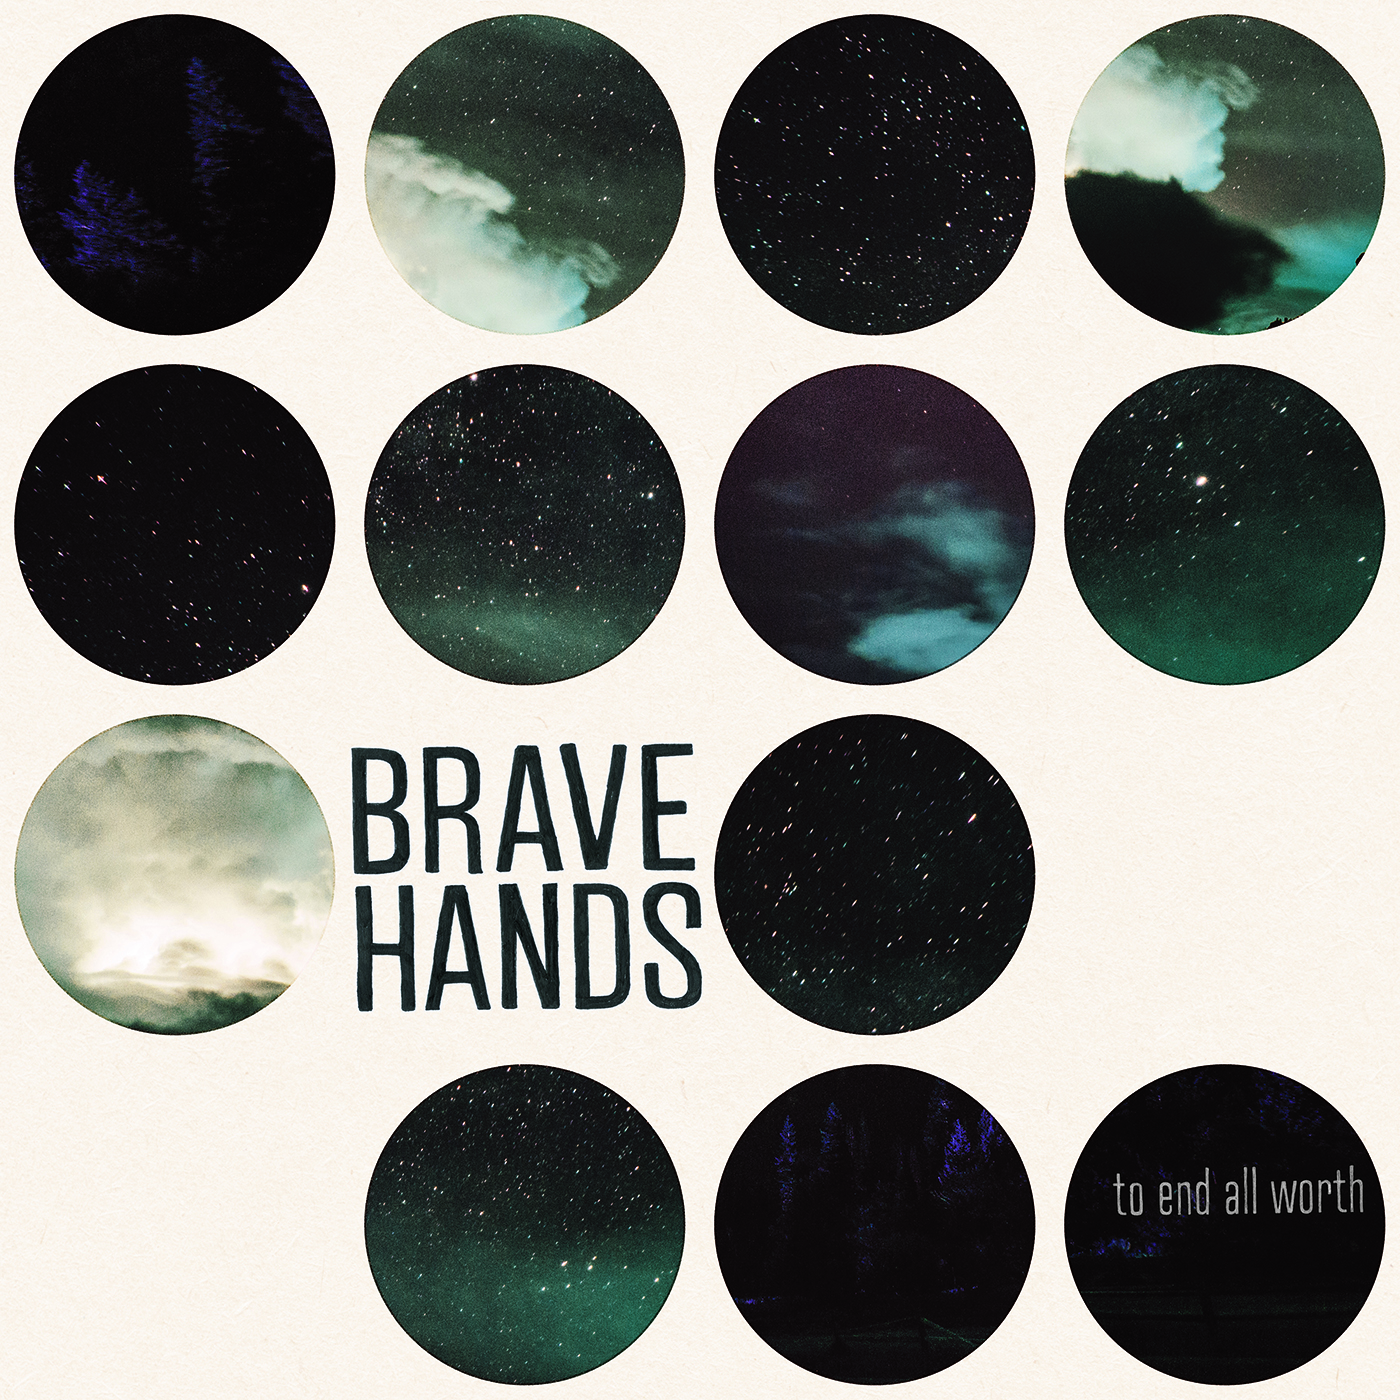 Brave Hands